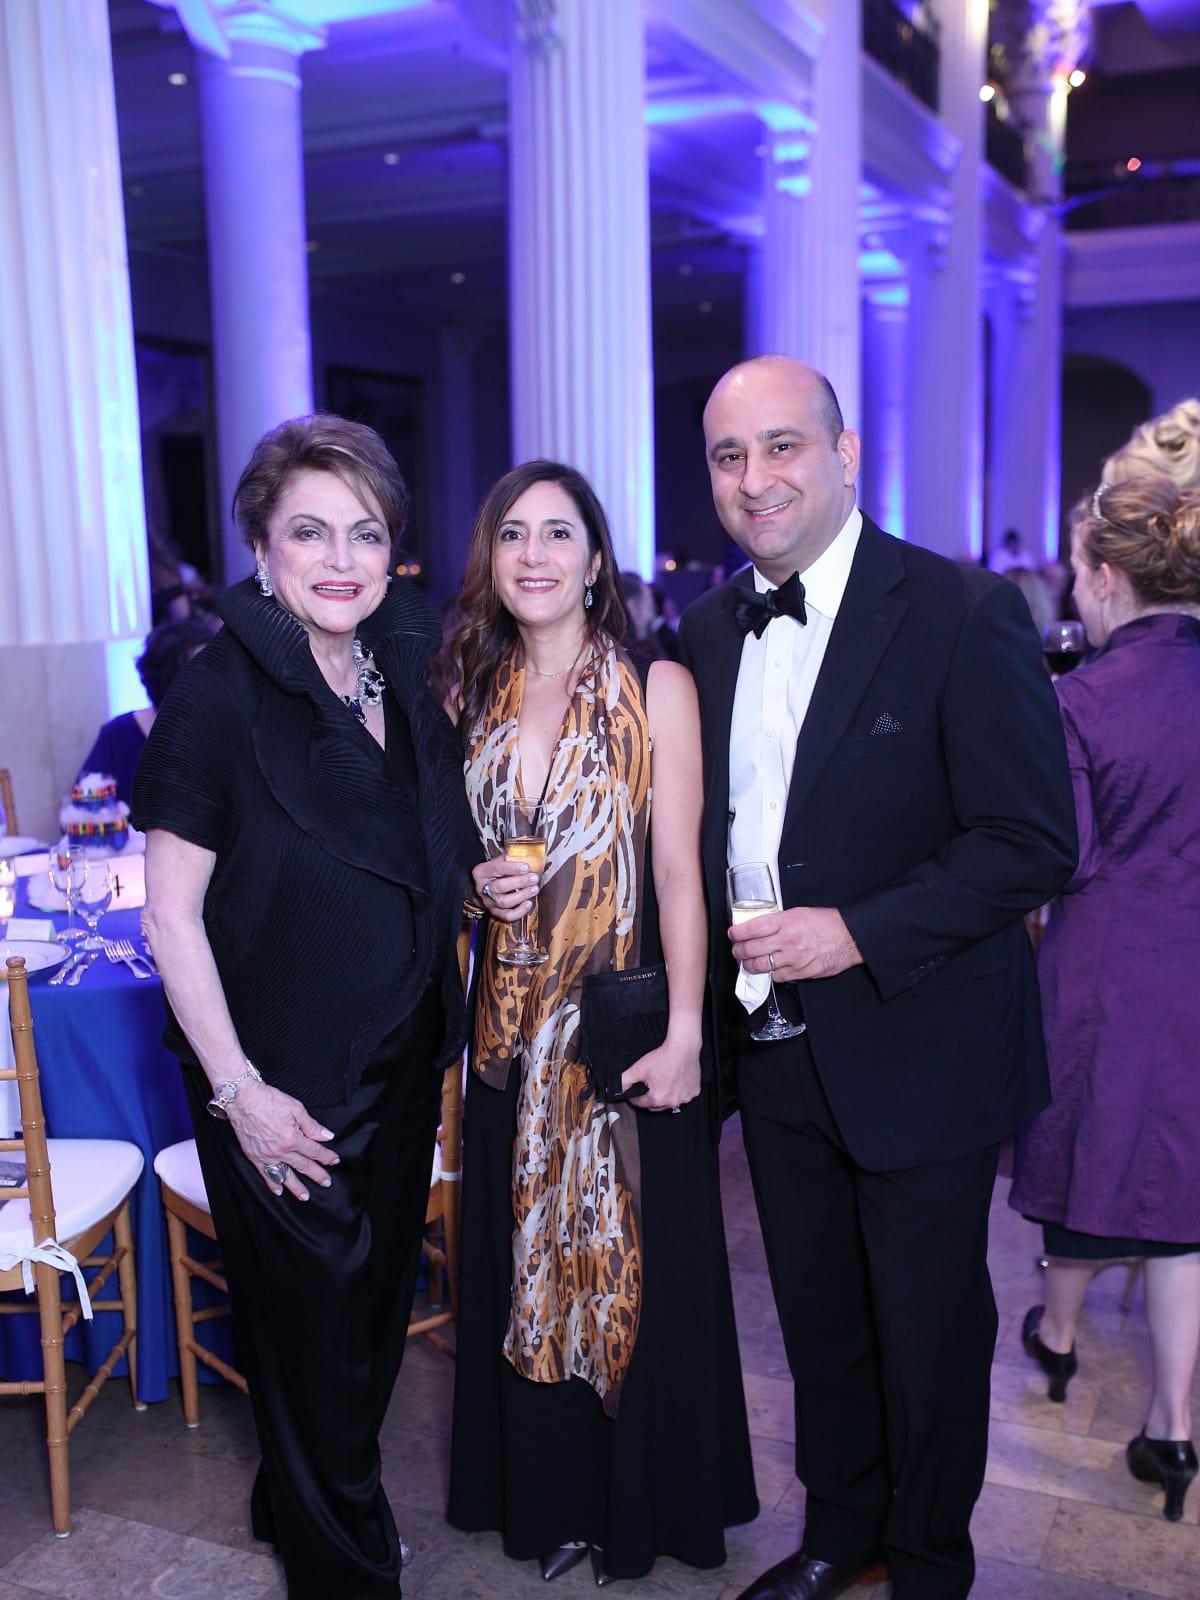 Beth Wolff - Avisheh Mohsenin  - Ali Naraghi at Denali Foundation Gala